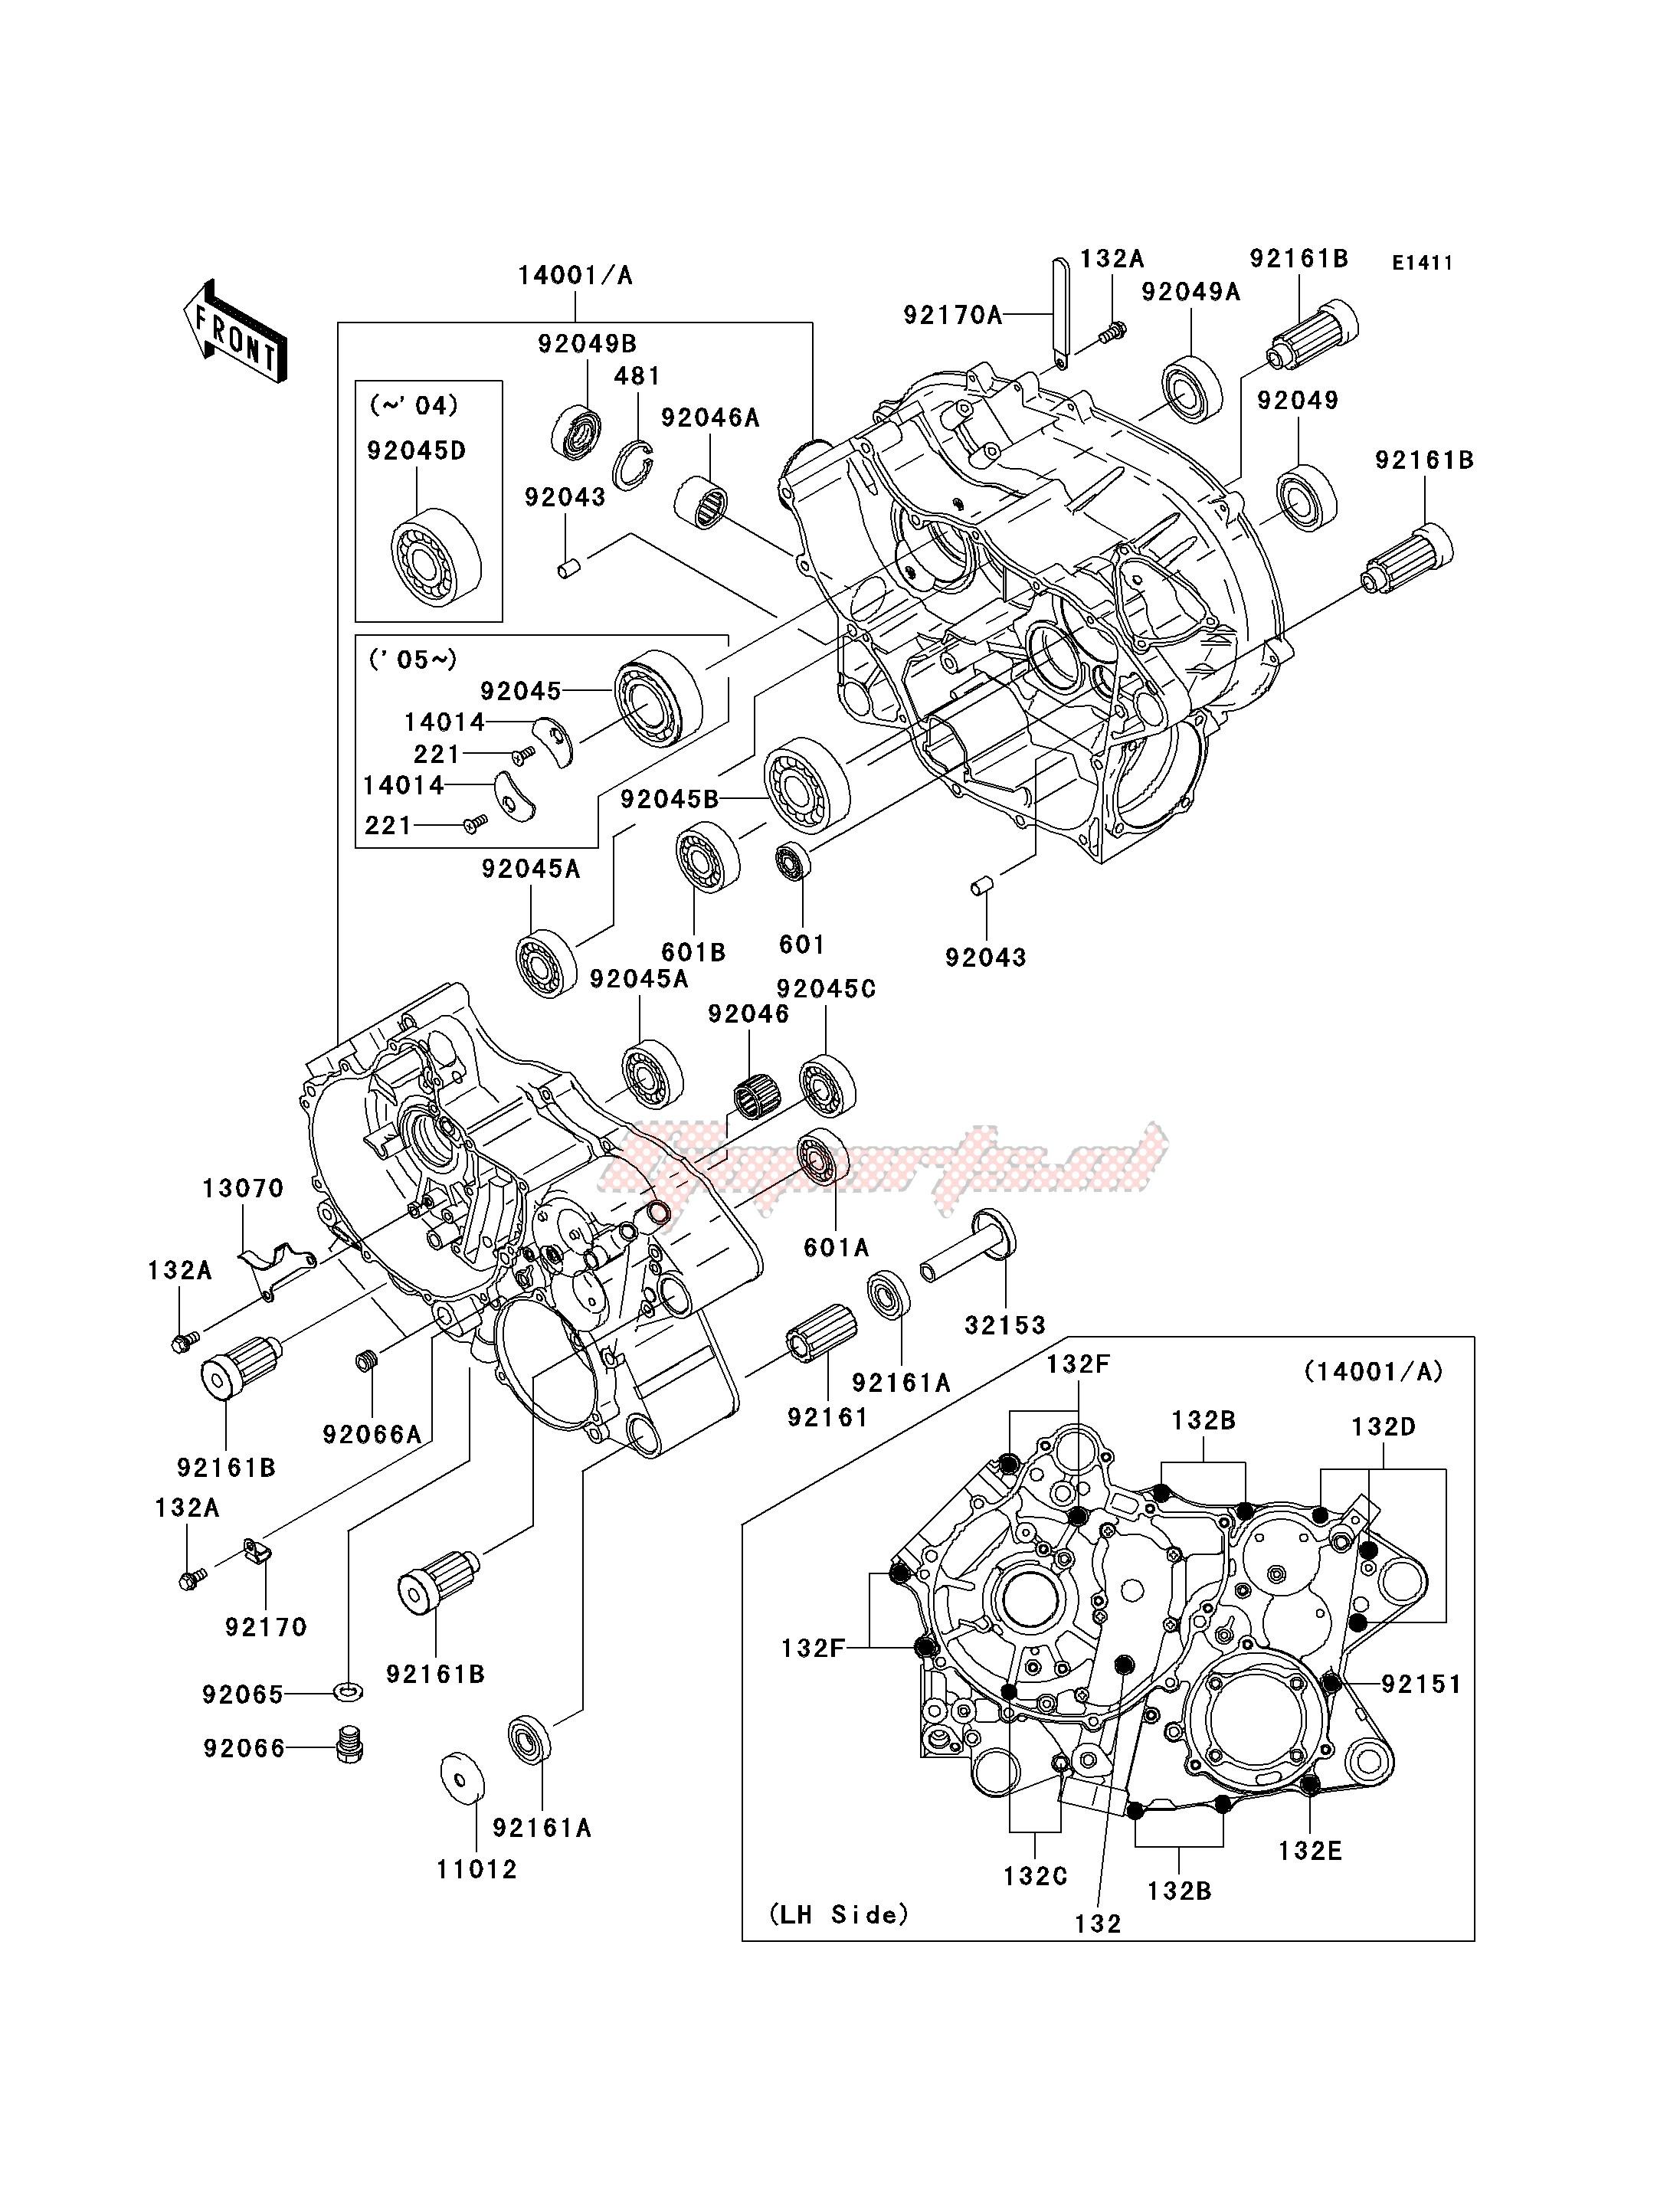 OEM CRANKCASE - Kawasaki [All terrain] KVF 360 C [PRAIRIE 360 4X4 ADVANTAGE  CLASSIC AND HARDWOODS GREEN HD] (C1-C3) [PRAIRIE 360 4X4 ADVANTAGE CLASSIC  AND HARDWOODS GREEN HD] / 2003 | Goparts | 2003 Kawasaki 360 Engine Diagram |  | Goparts